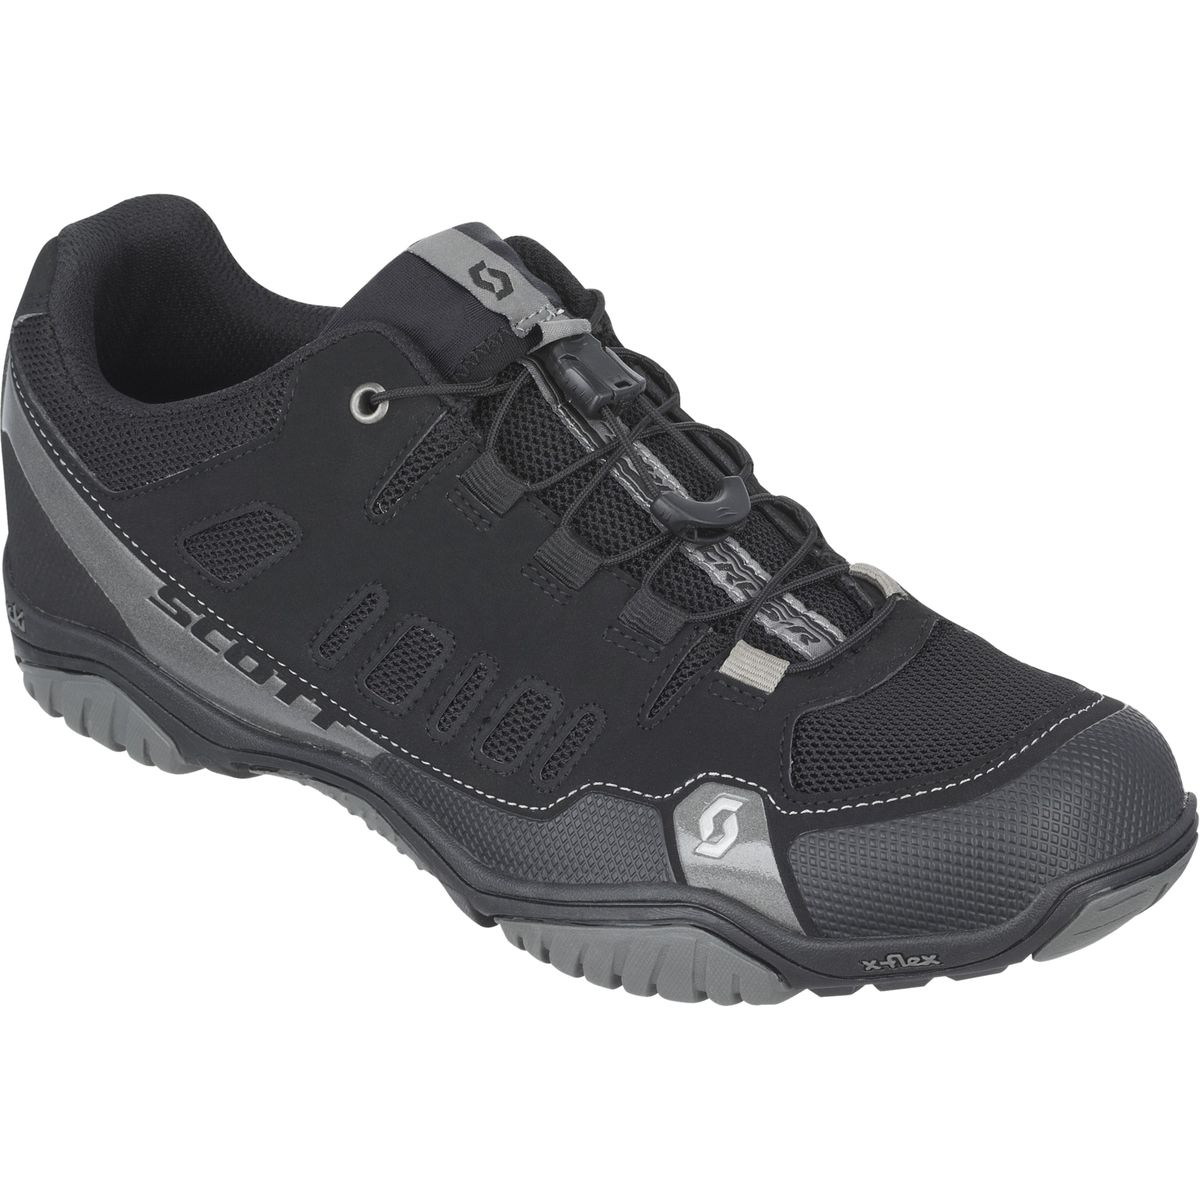 Scott CRUS-R Shoes - Men's